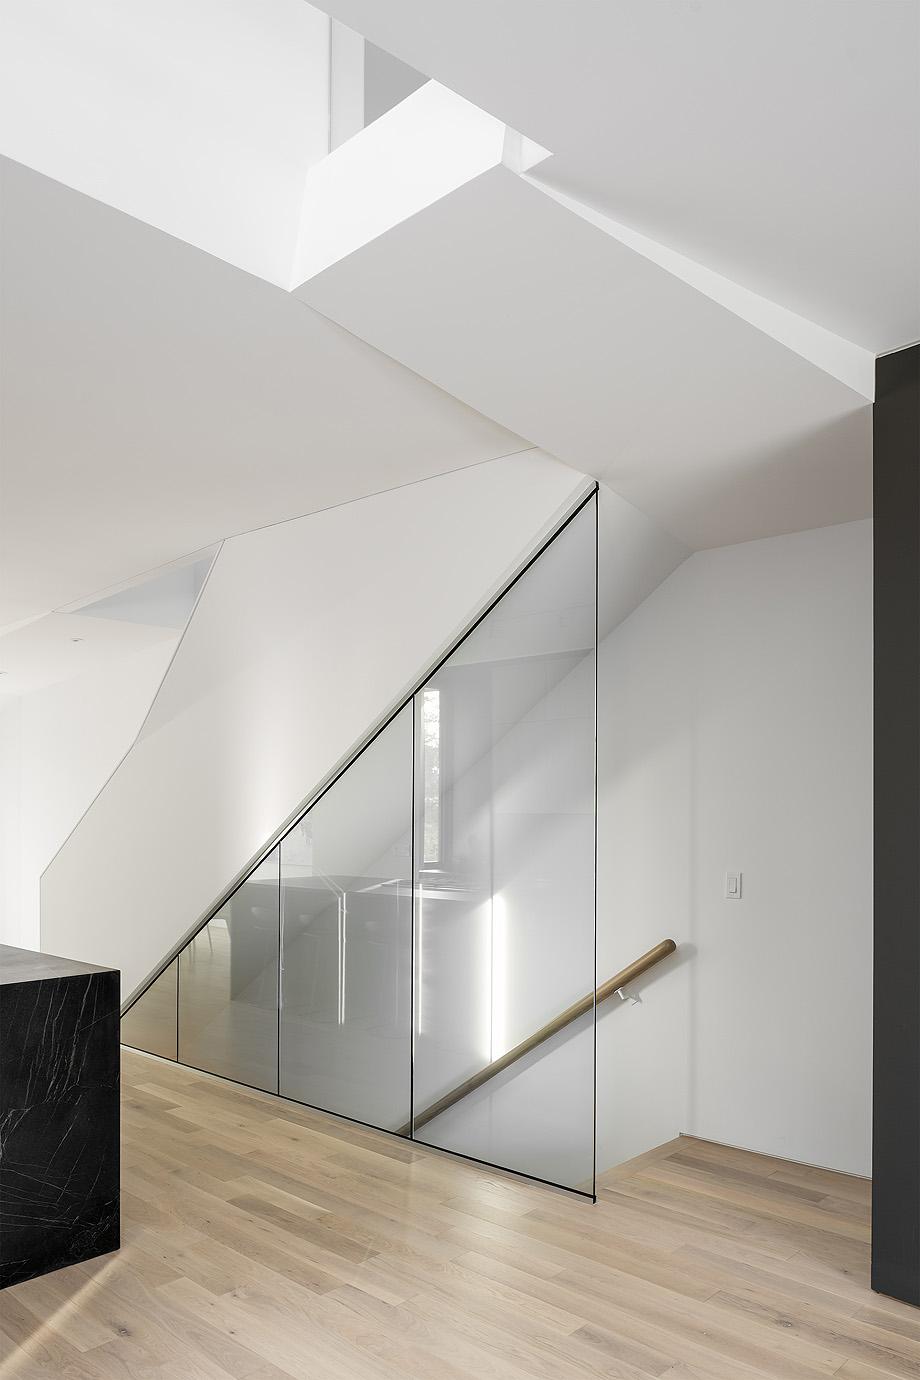 casa tesseract de phaedrus studio - foto ryan fung (14)